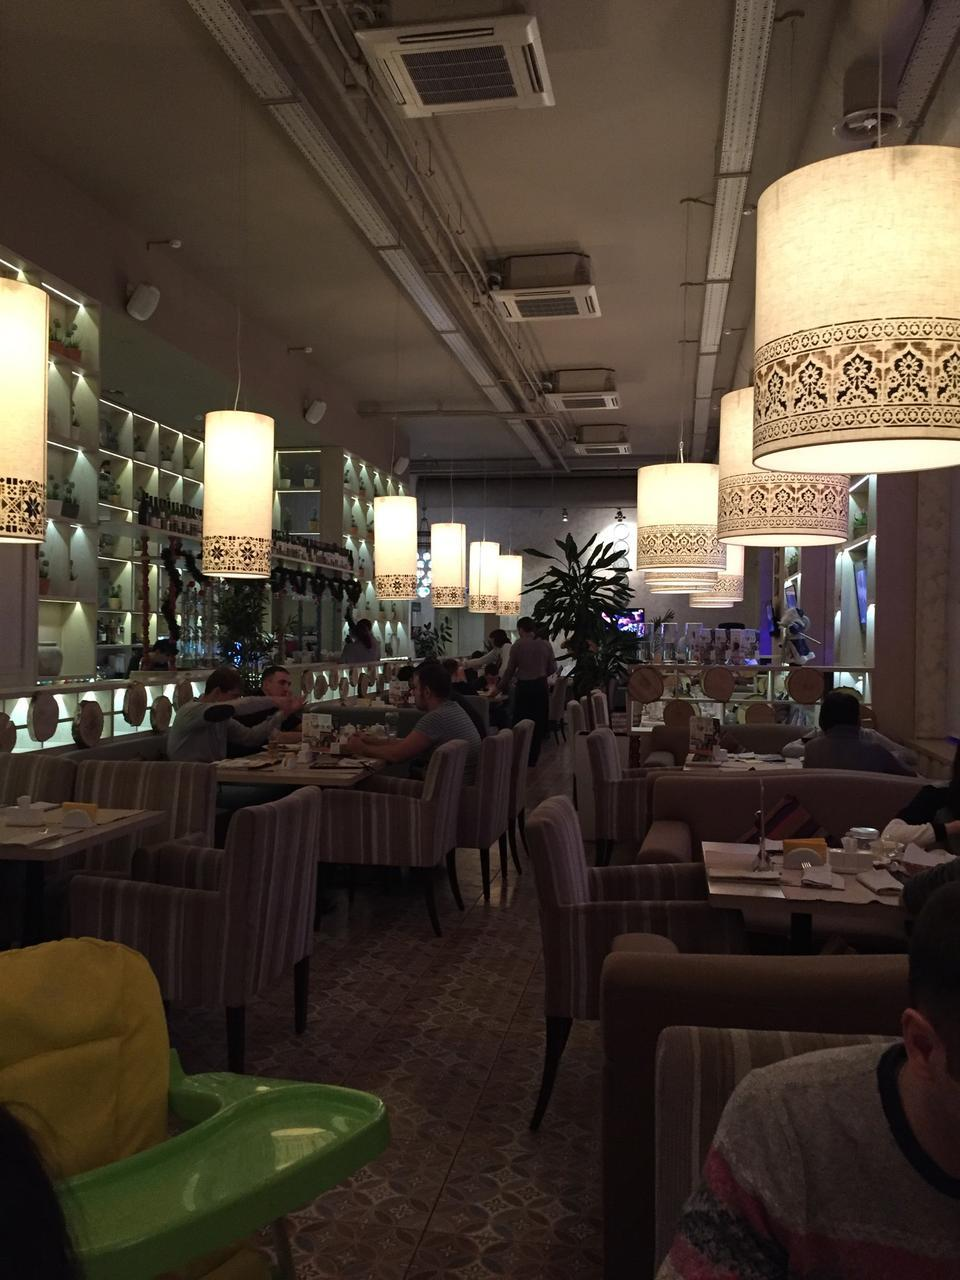 Восточное Кафе Лепешка в Королеве фото 52